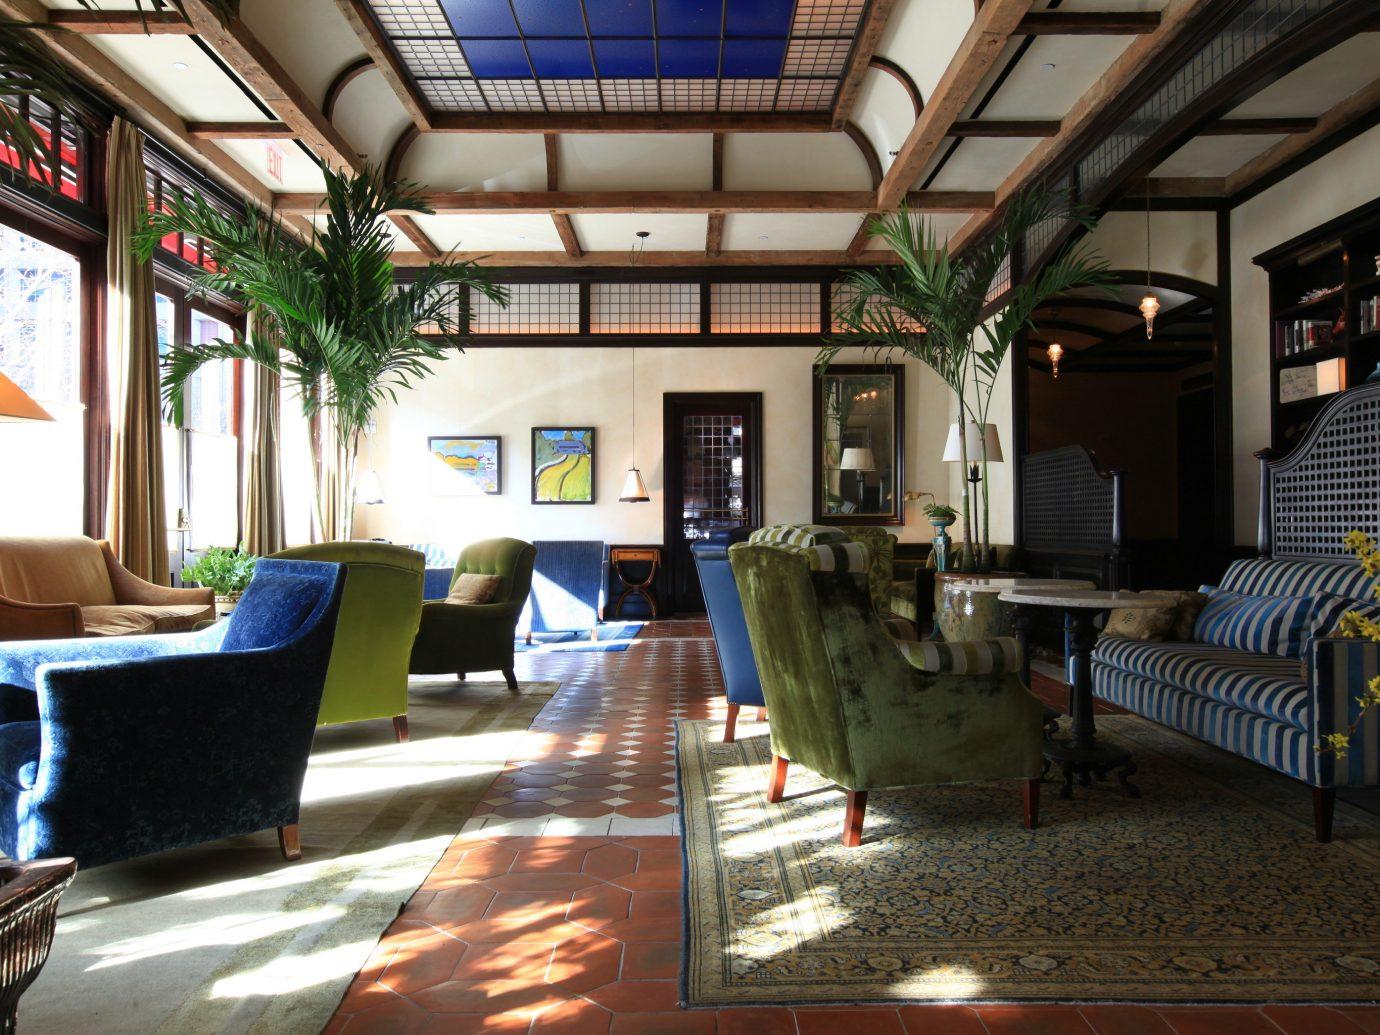 Celebs Hotels indoor Living room floor chair interior design living room real estate furniture Lobby estate loft area